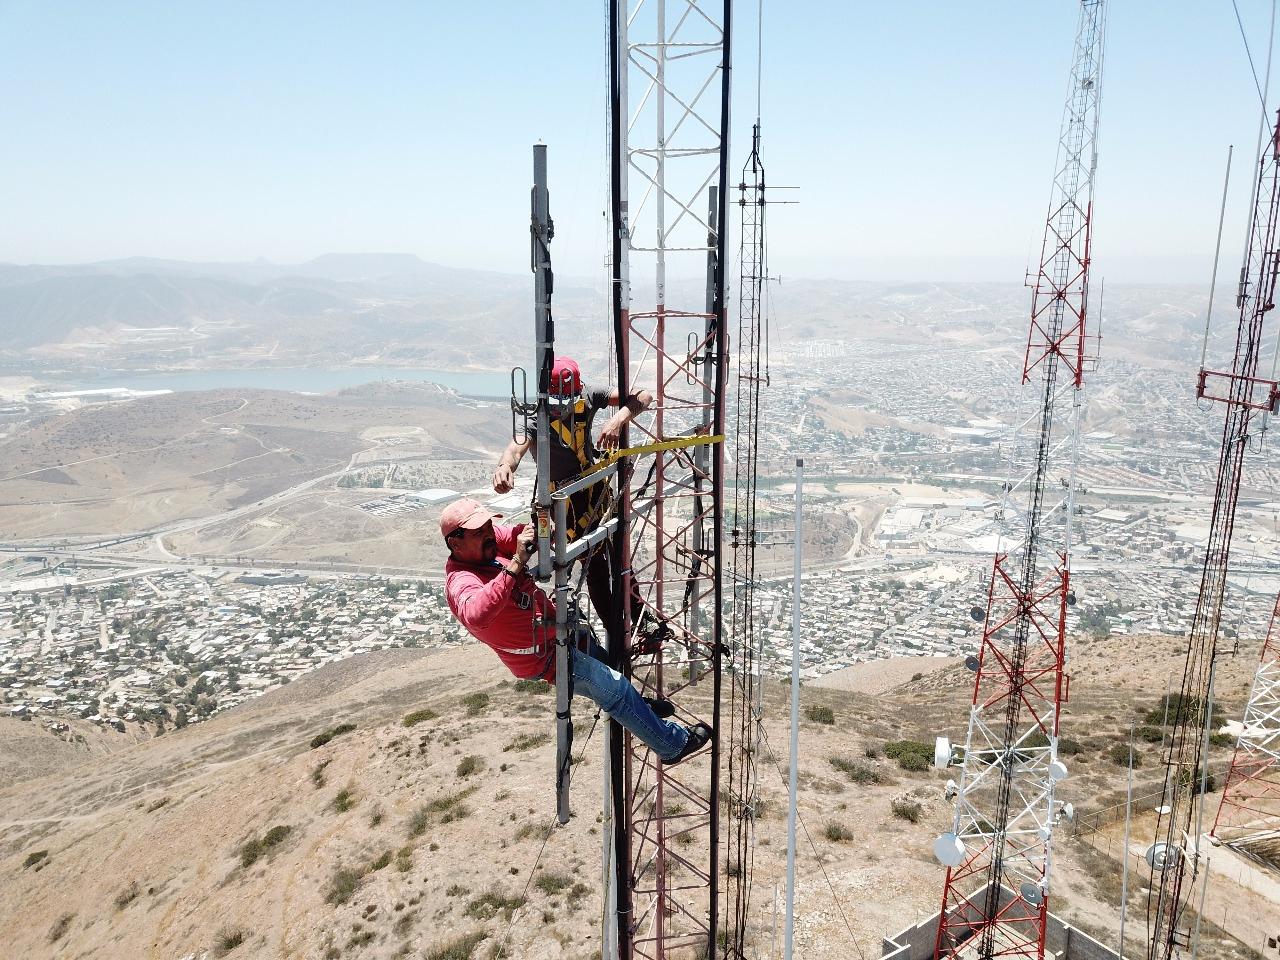 Replace UHF antenna